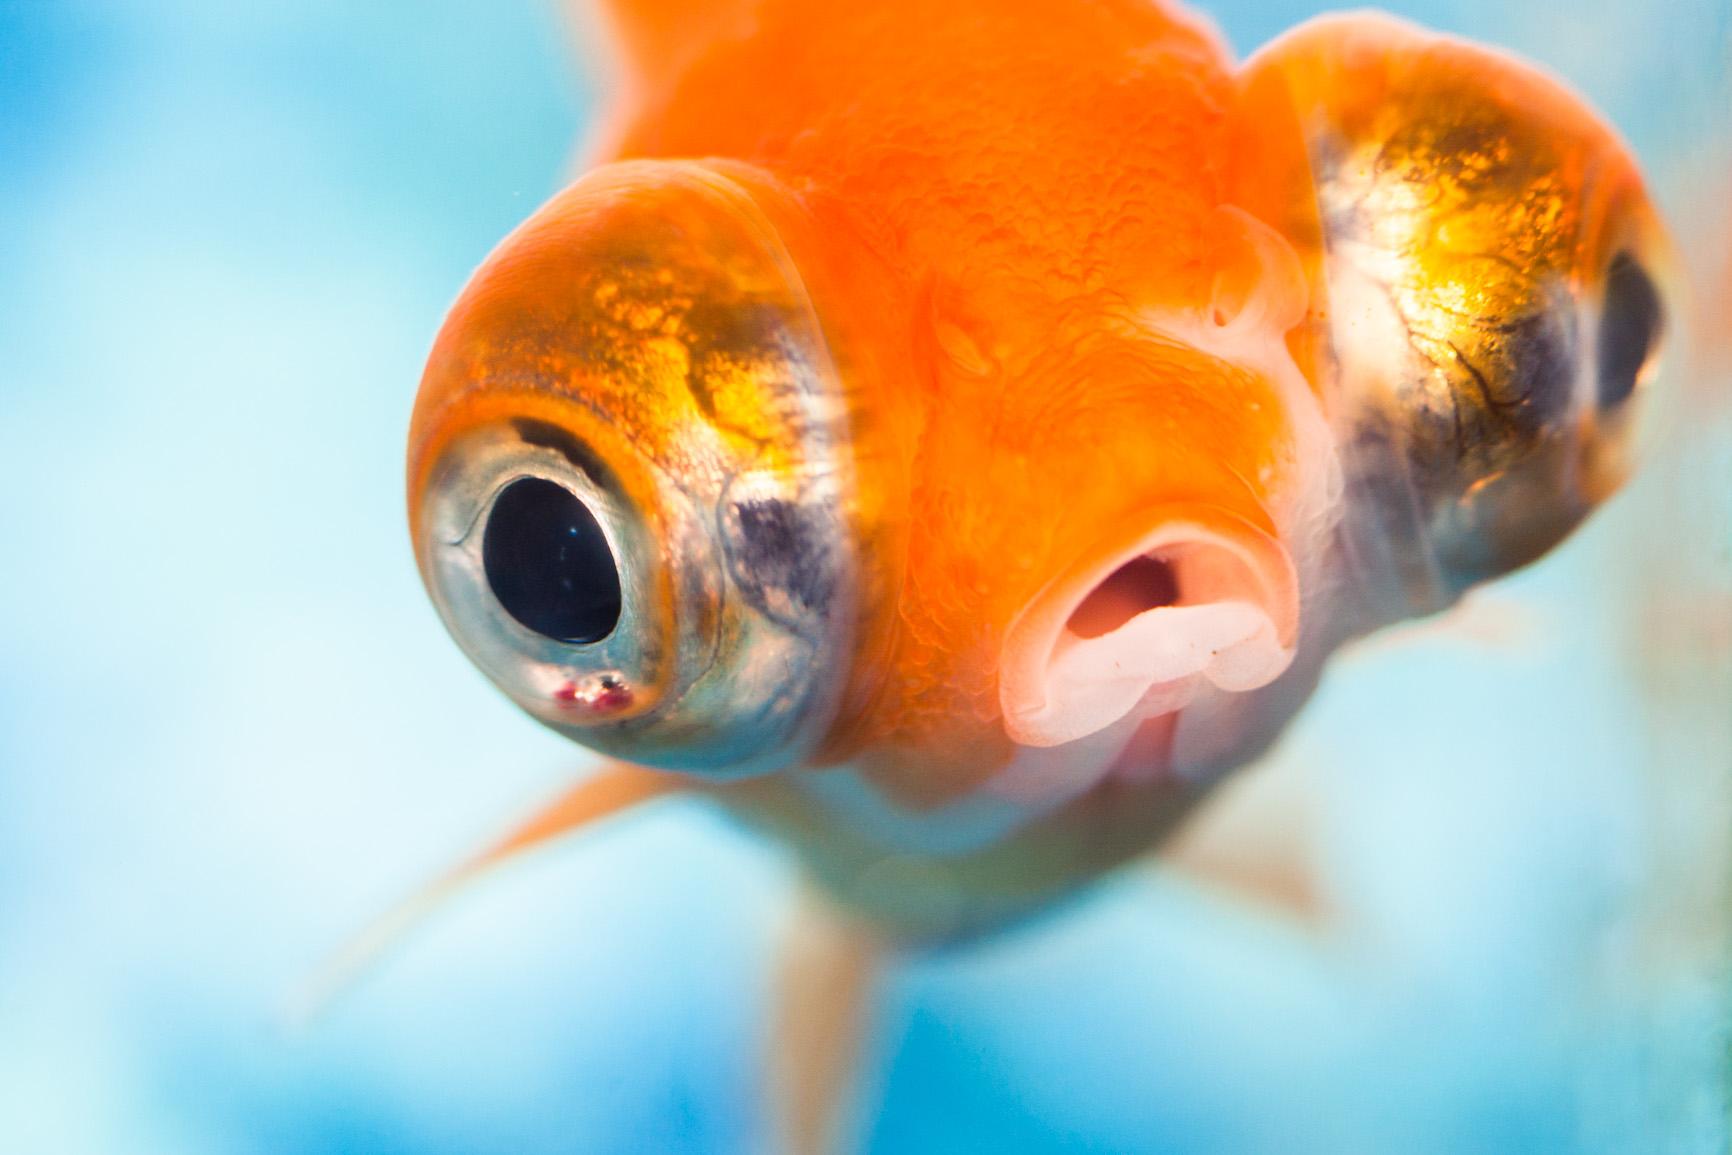 ... aquarium. I named him Lippy because of his large Angelina Jolie lips